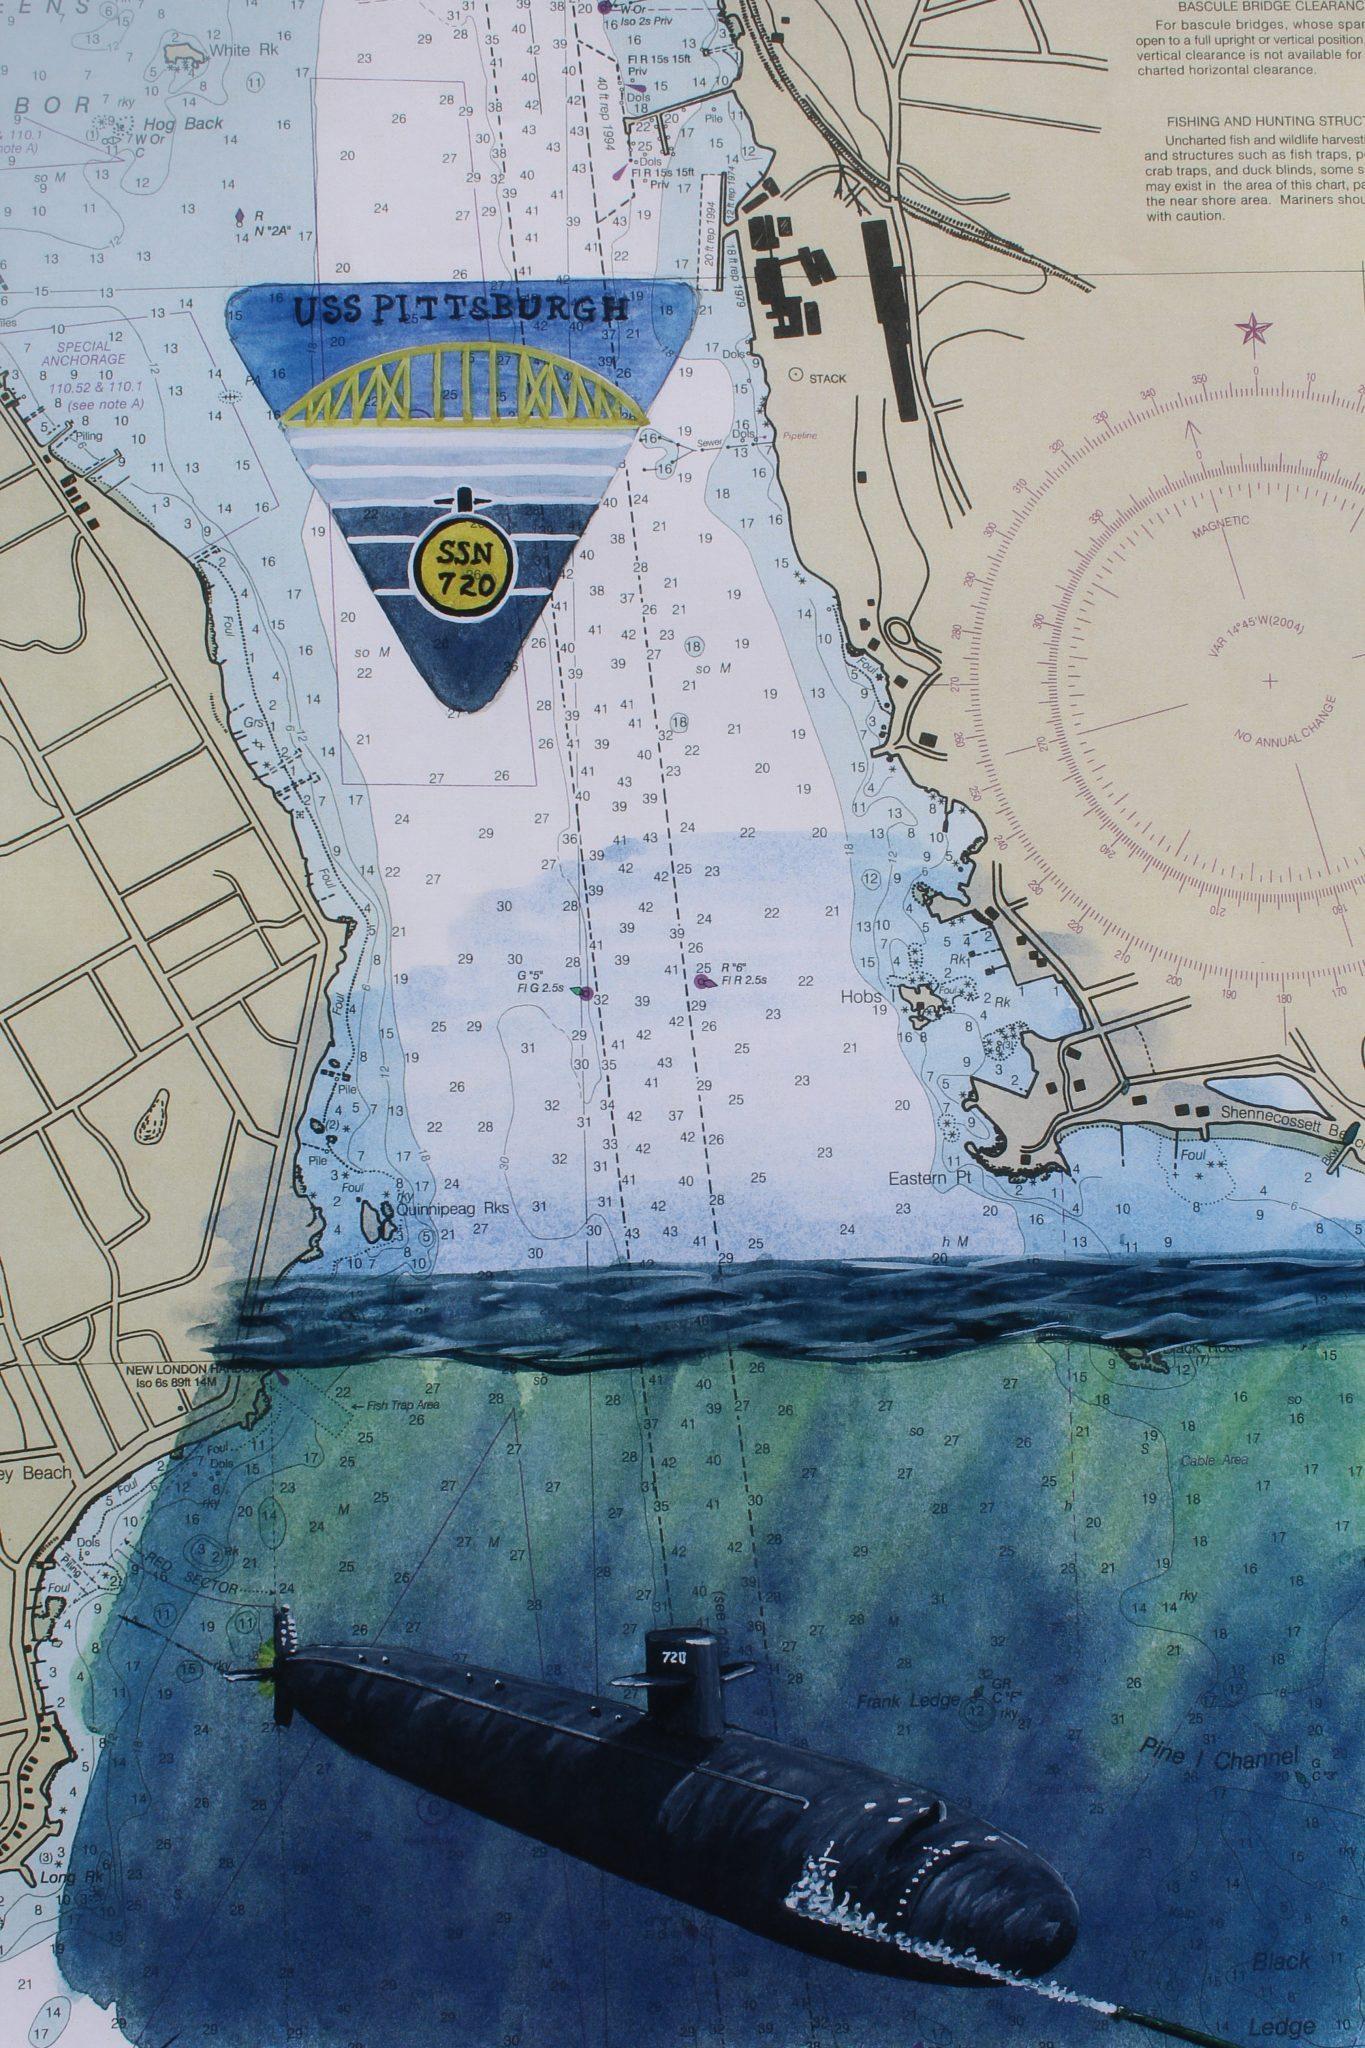 Submarine Painting by Dan Price USS Pittsburgh Original Artwork of SSN 720